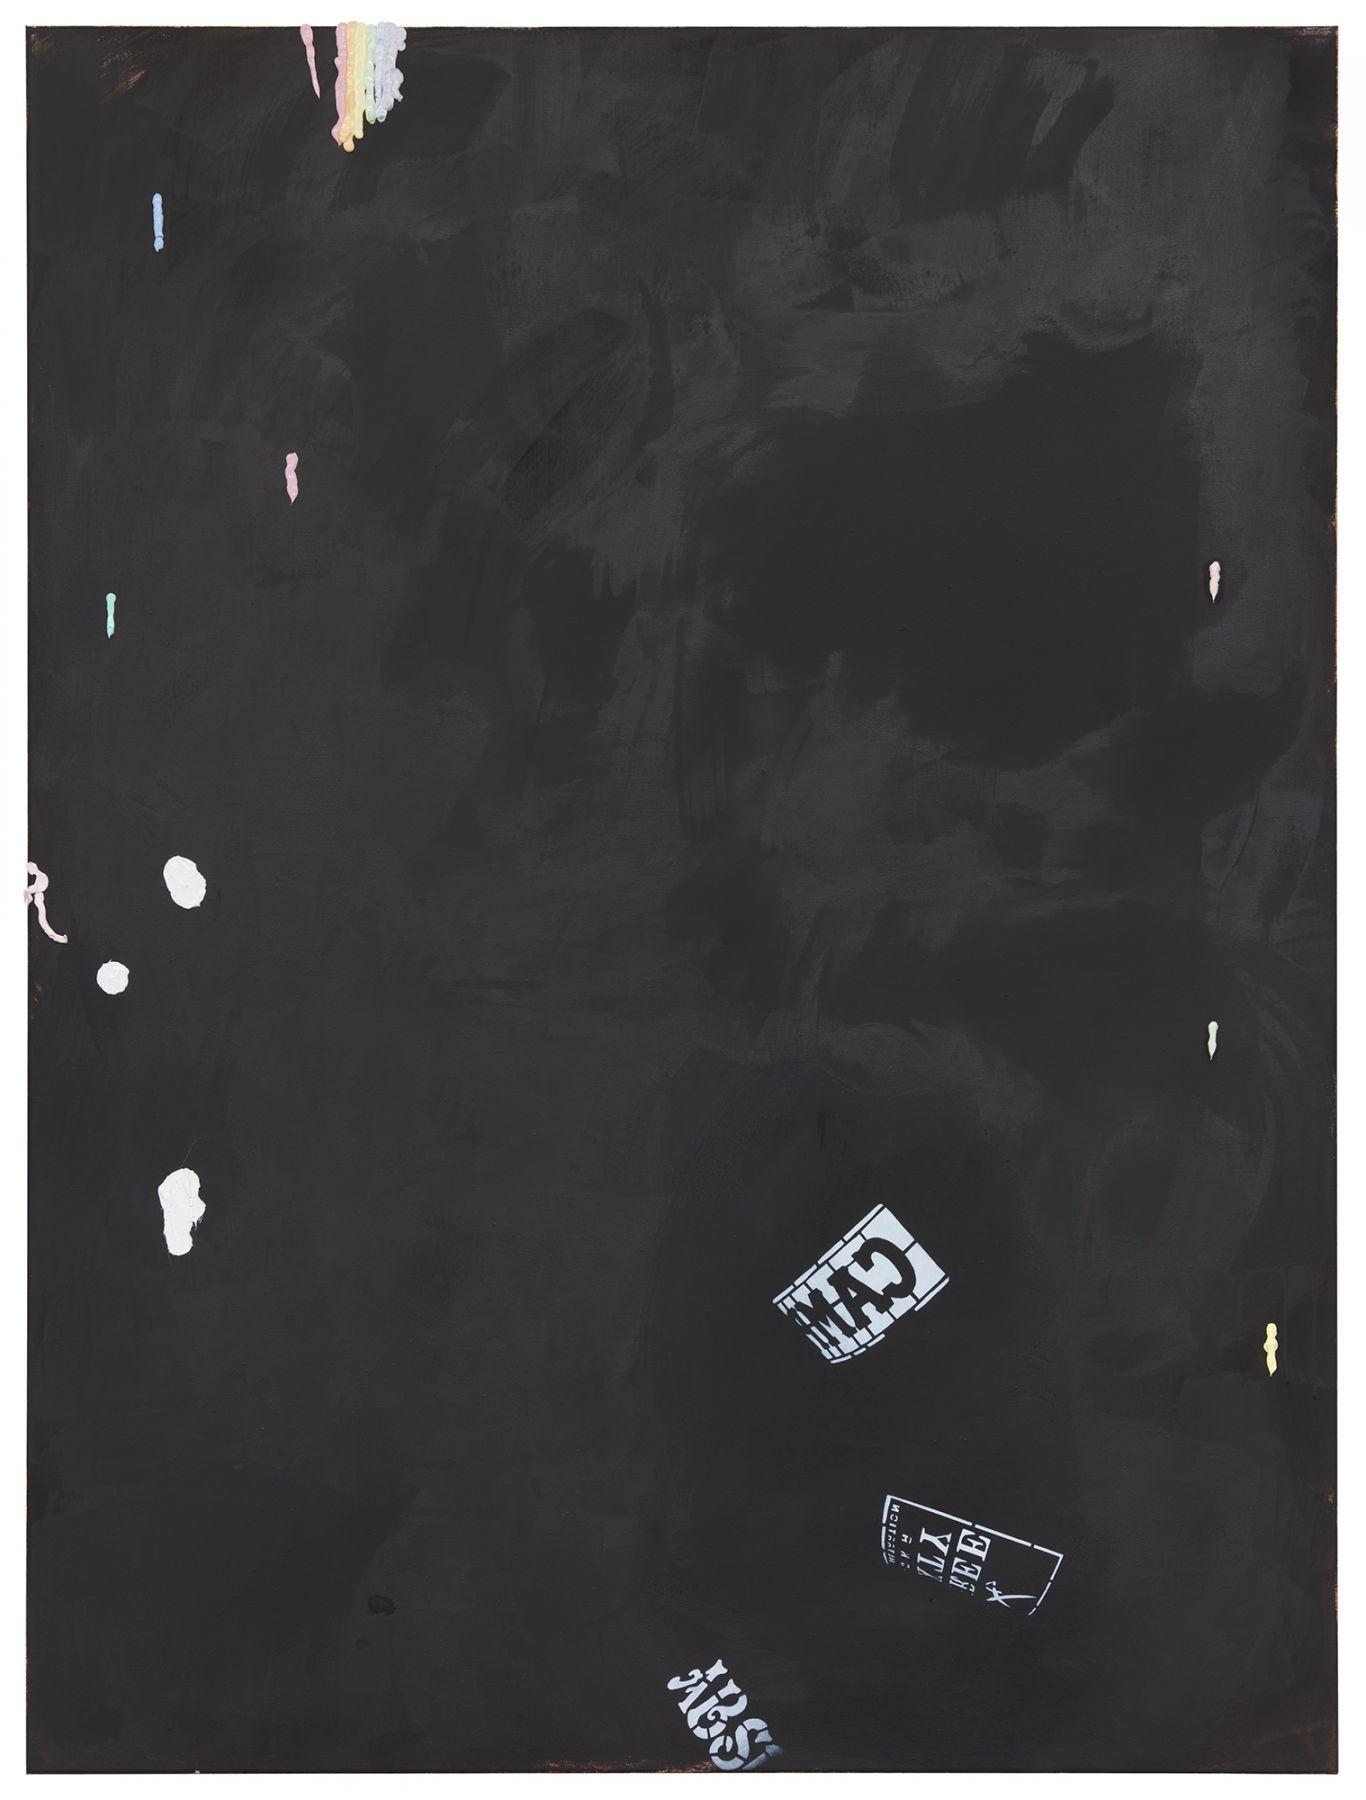 Monika Baer on hold (2), 2015 Acrylic, ink, oil on canvas 70 3/4 x 53 1/4 inches (180 x 135 cm)